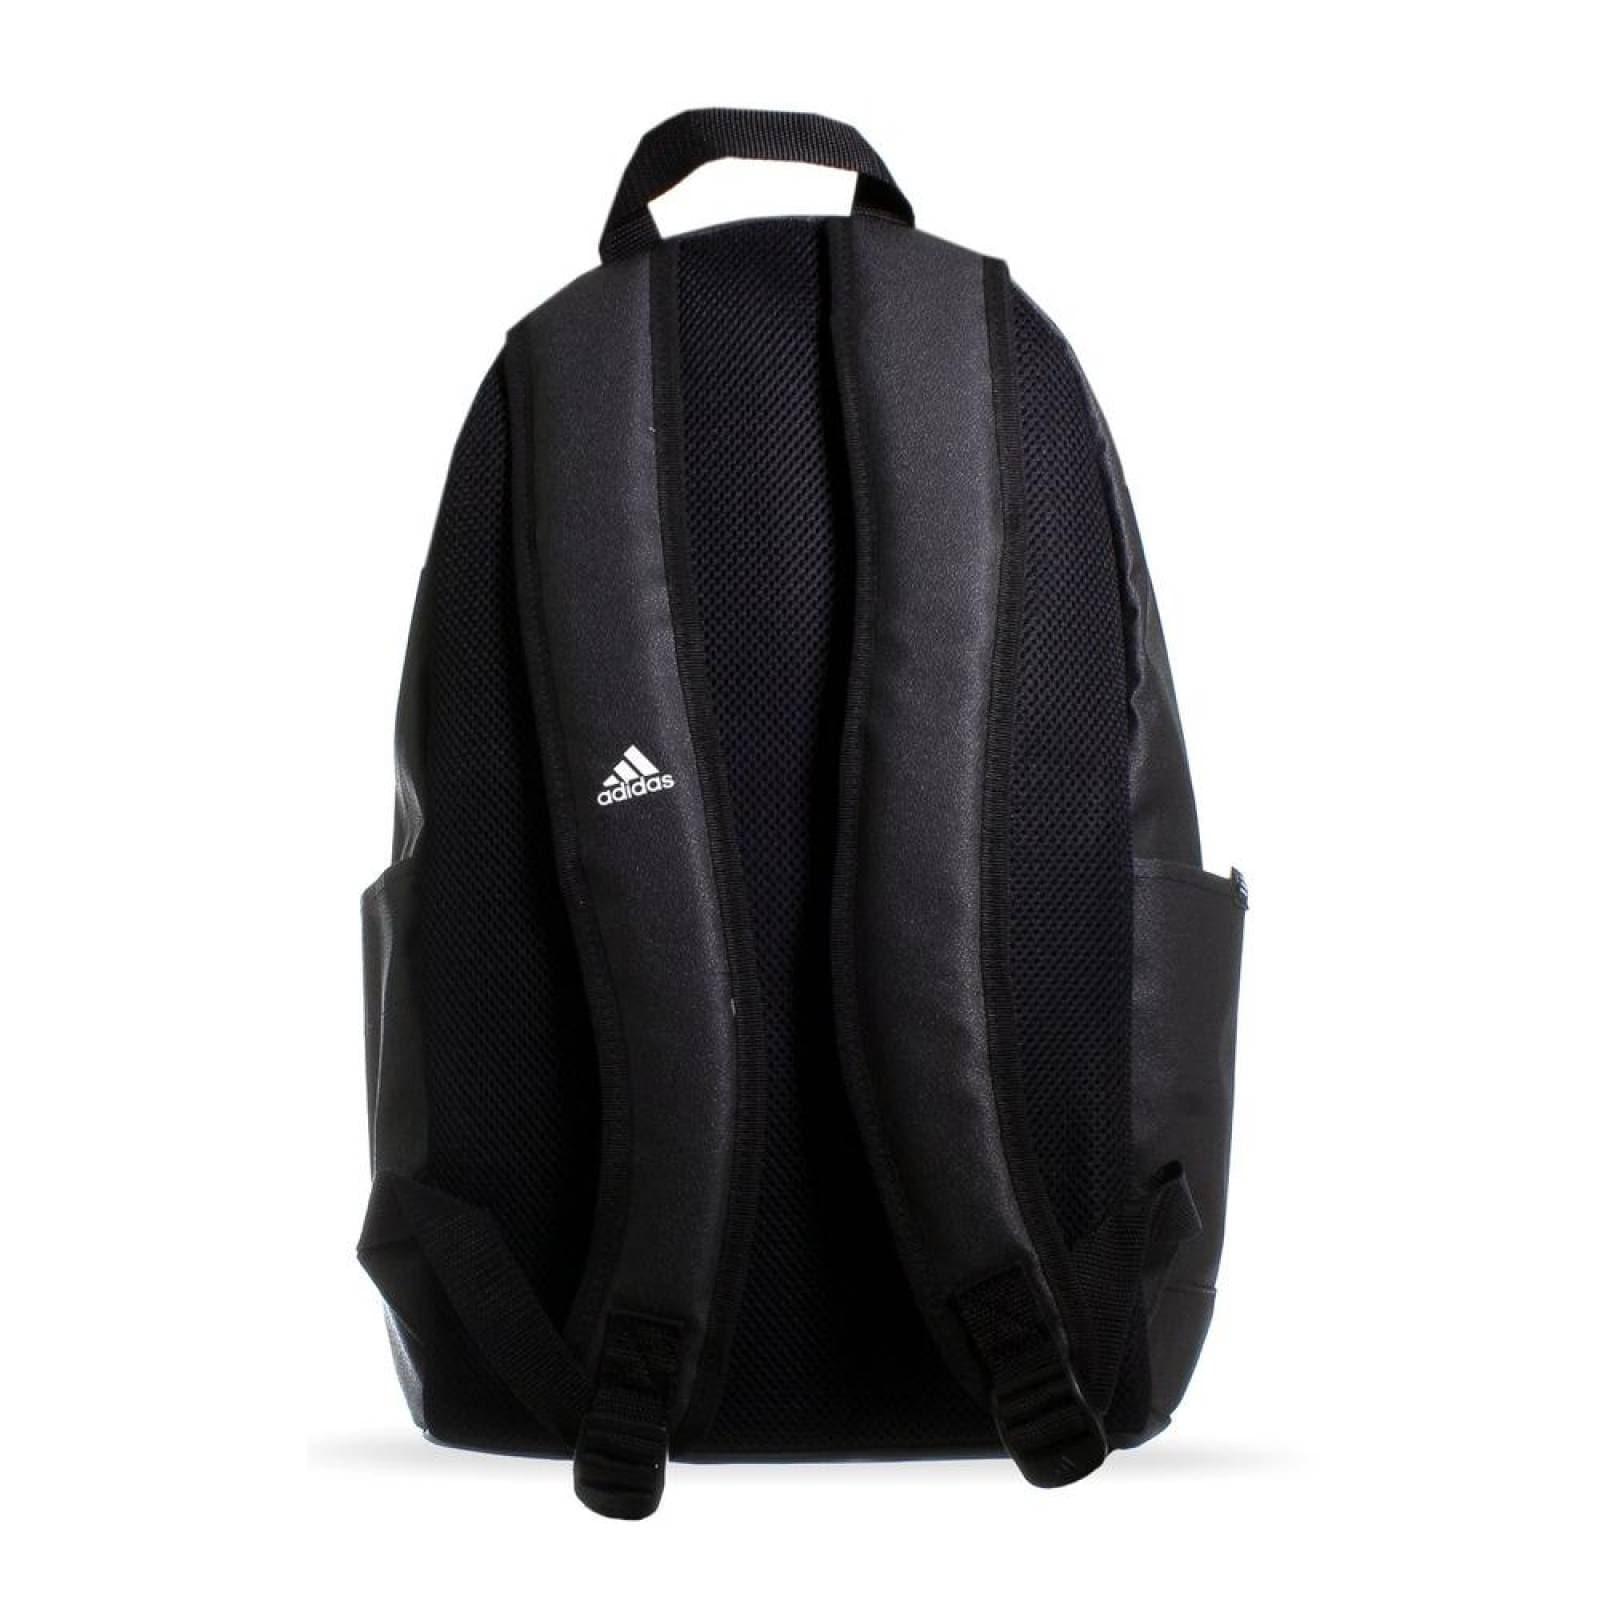 Mochila Adidas Classic Urban DT2605 Negro Unisex